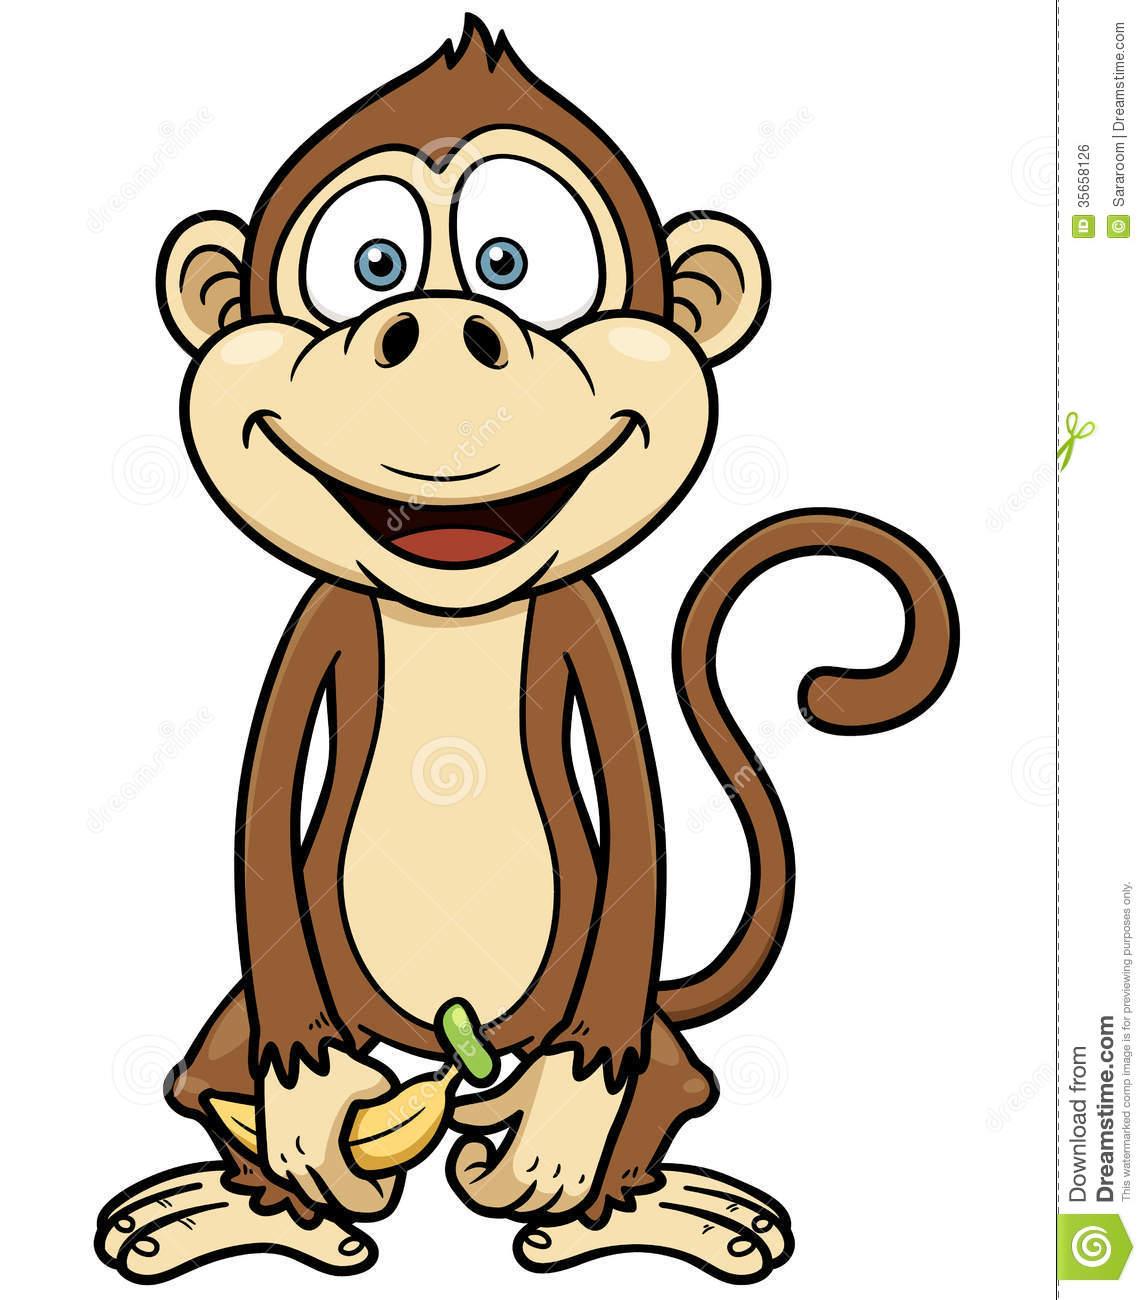 monkey cartoon wallpaper - photo #24